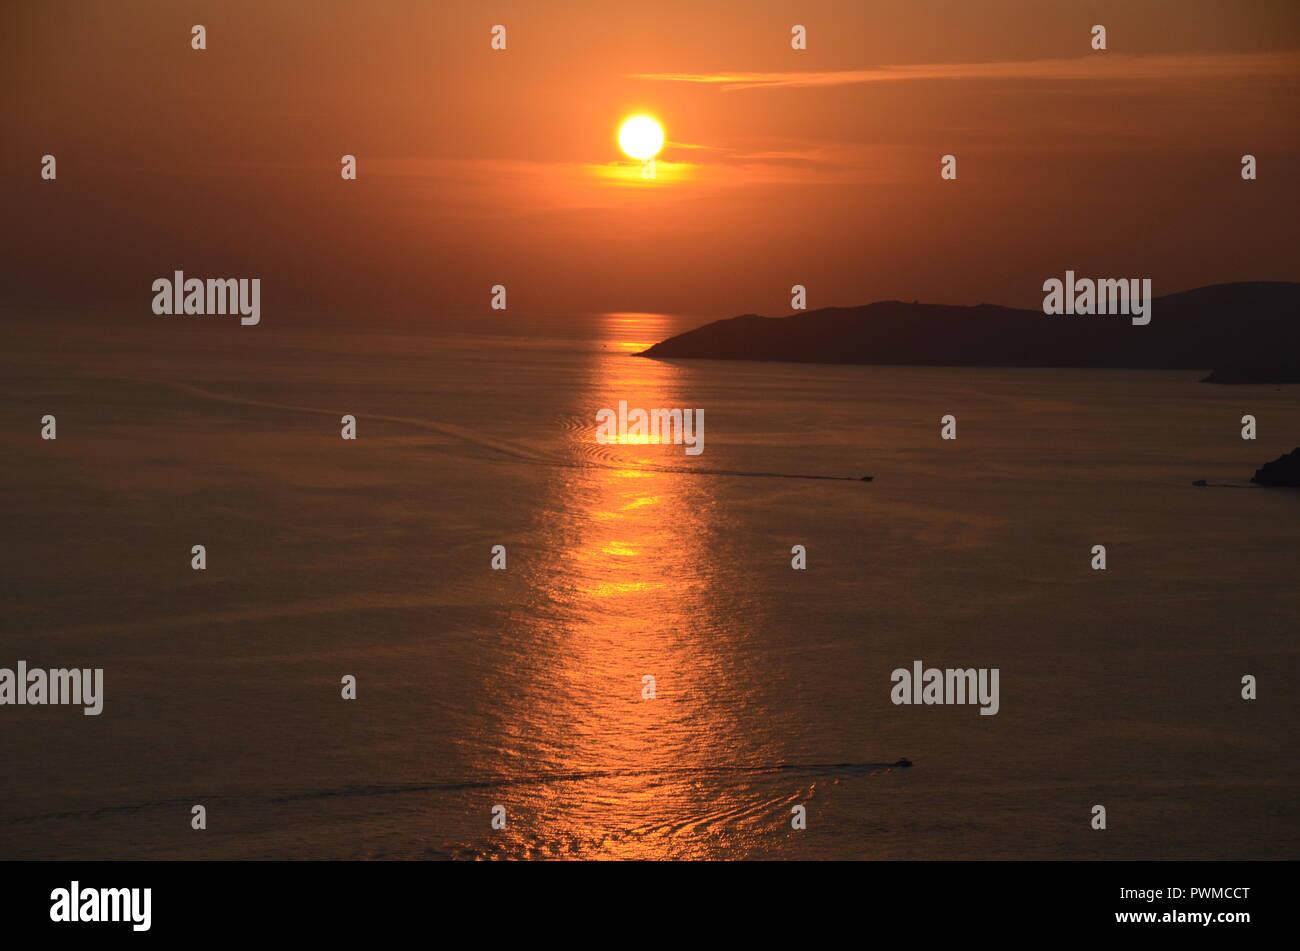 sunset over the adriatic sea at budva montenegro - Stock Image